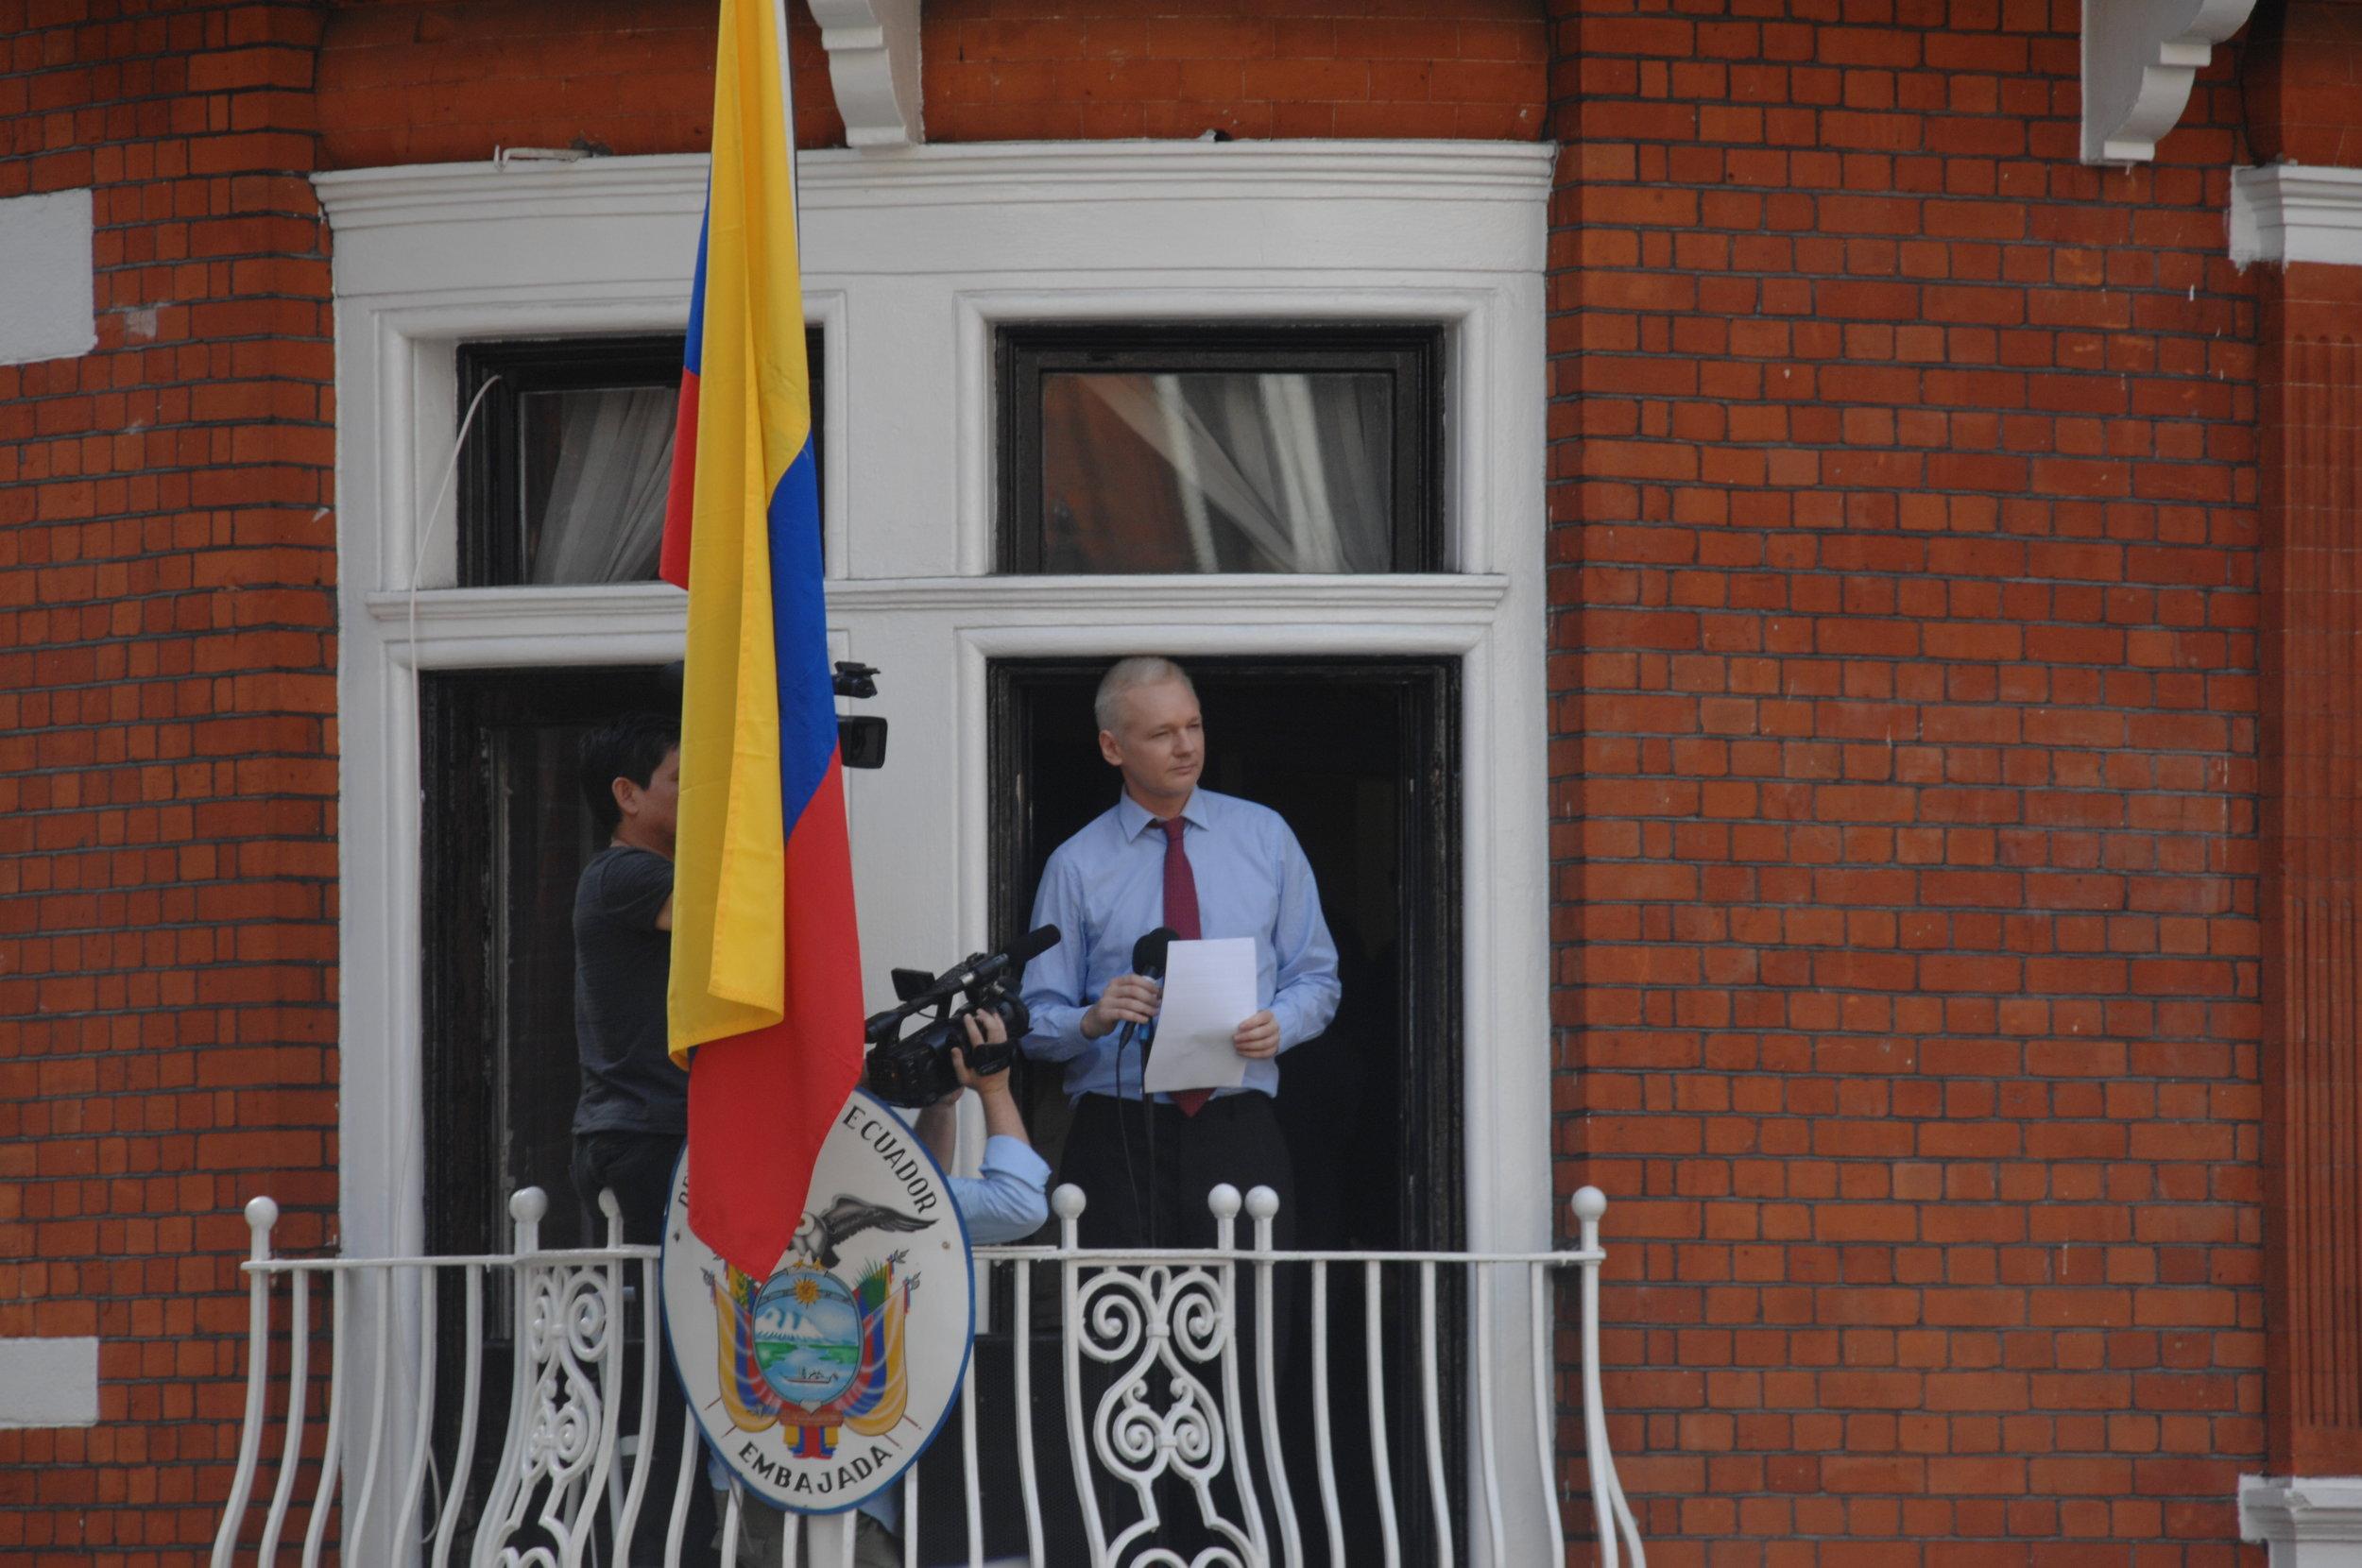 Photo courtesy of WikiCommons Julian Assange at the U.K. Ecuadorian Embassy in London in 2012.